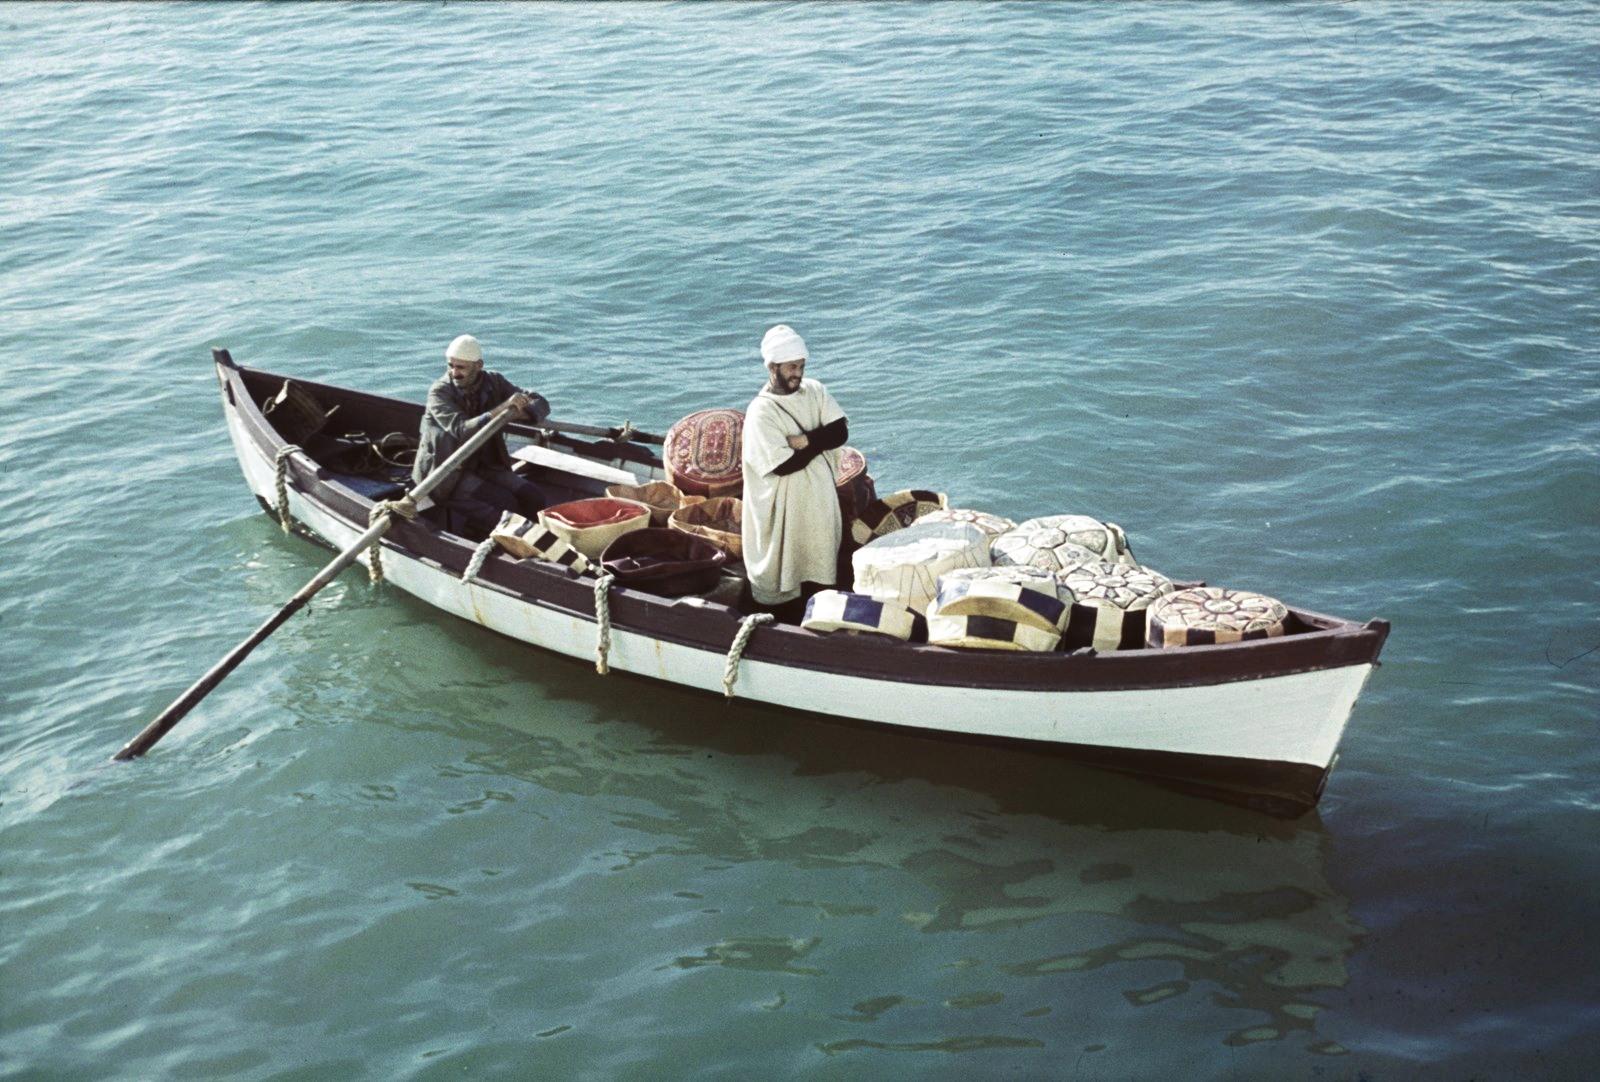 Александрия. Торговцы на лодках в гавани